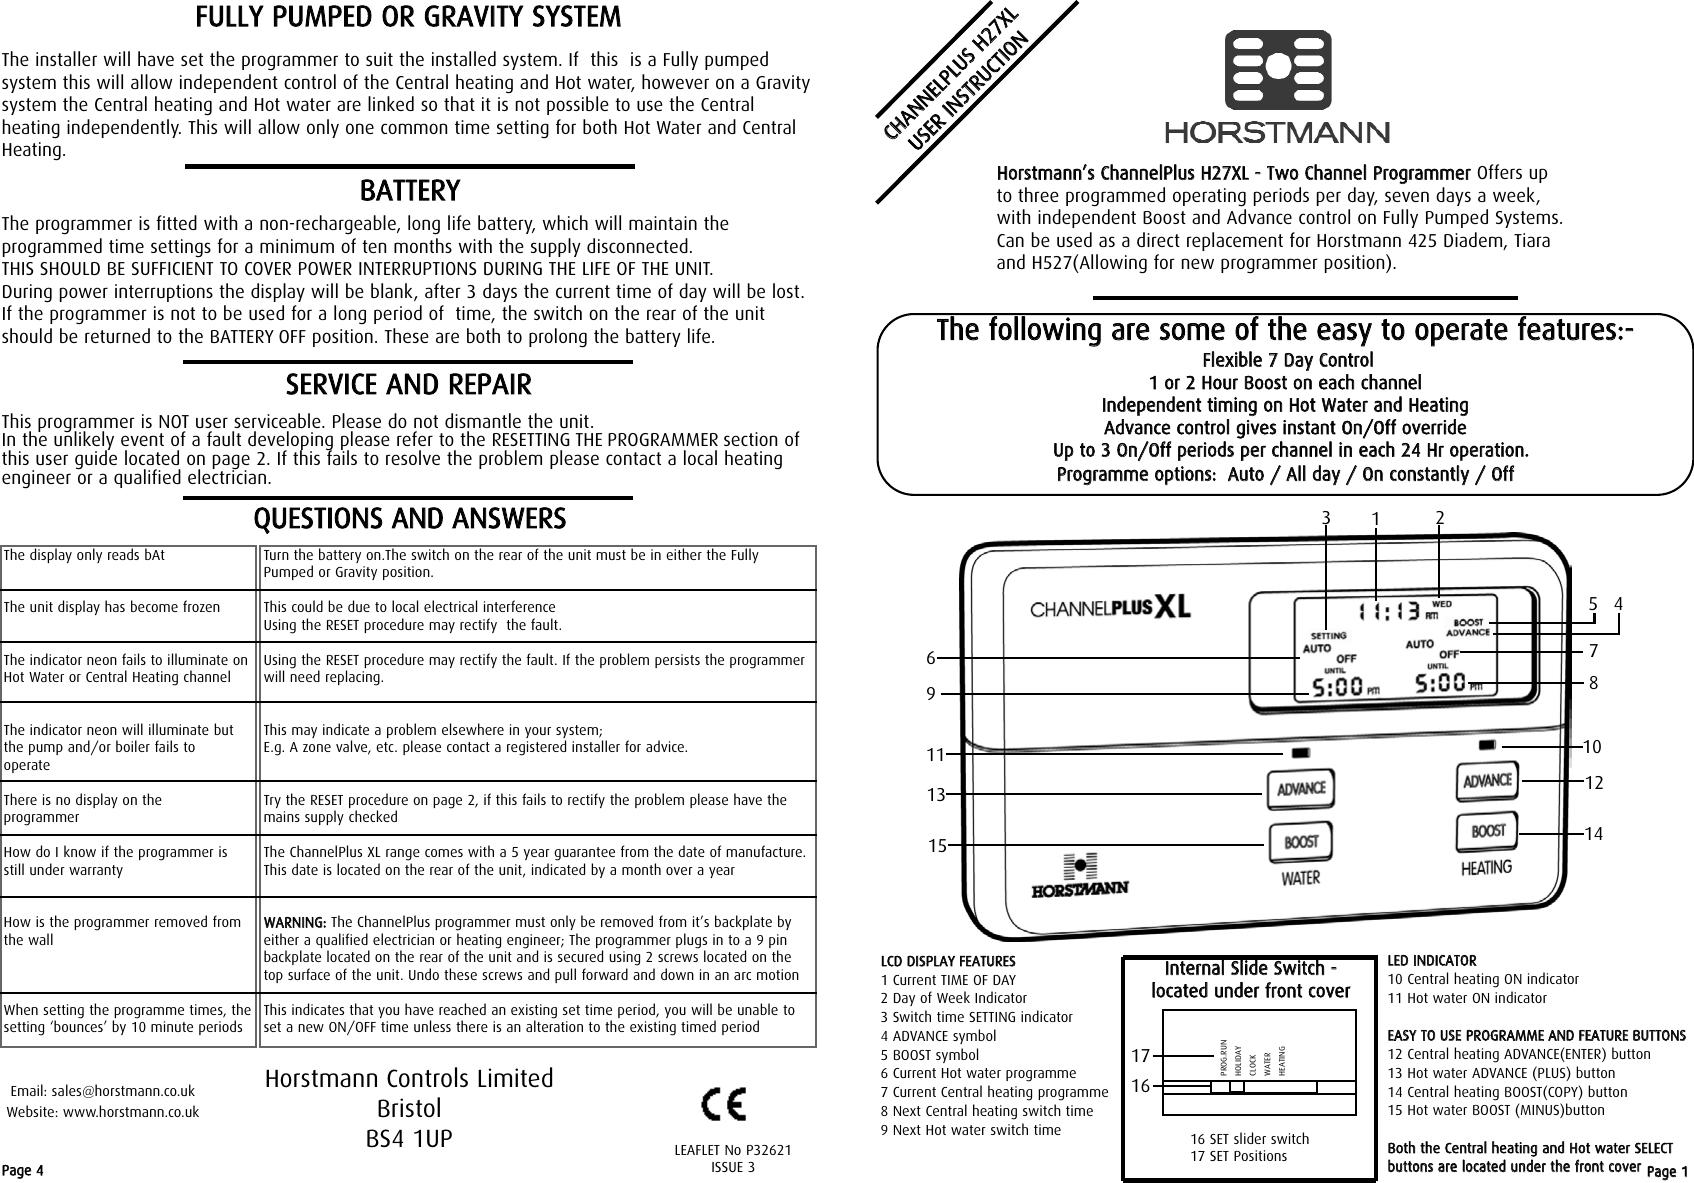 Horstmann channelplus h27xl users manual u freerunsca Images